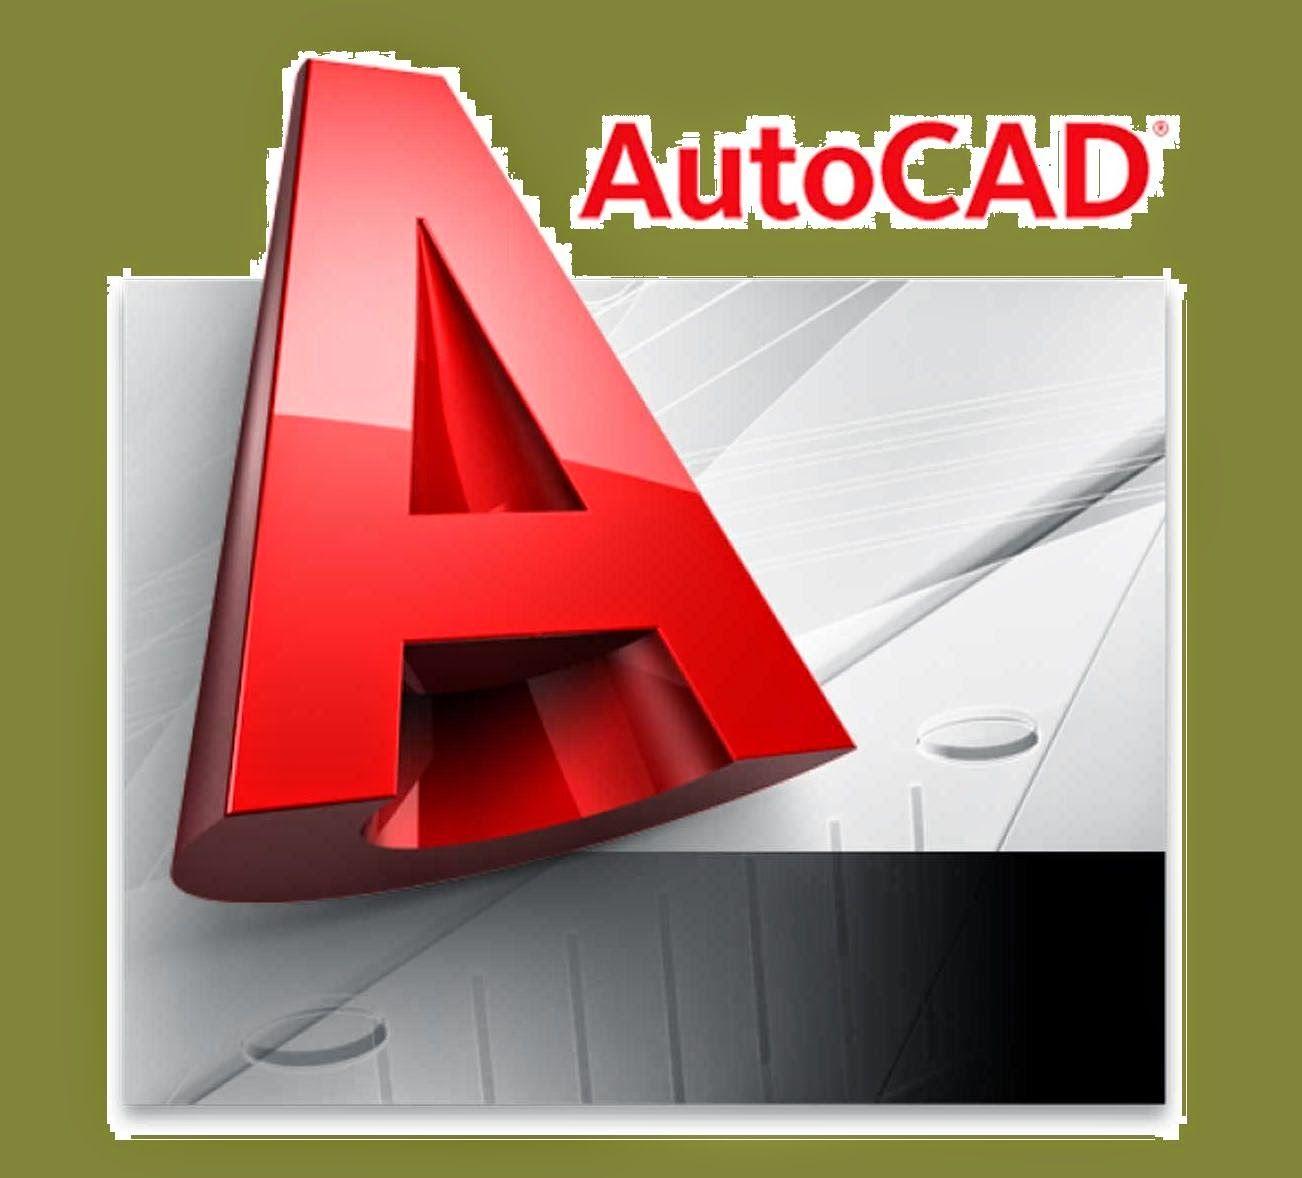 12 Autocad 2014 Ideas Autocad 2014 Autocad Autodesk